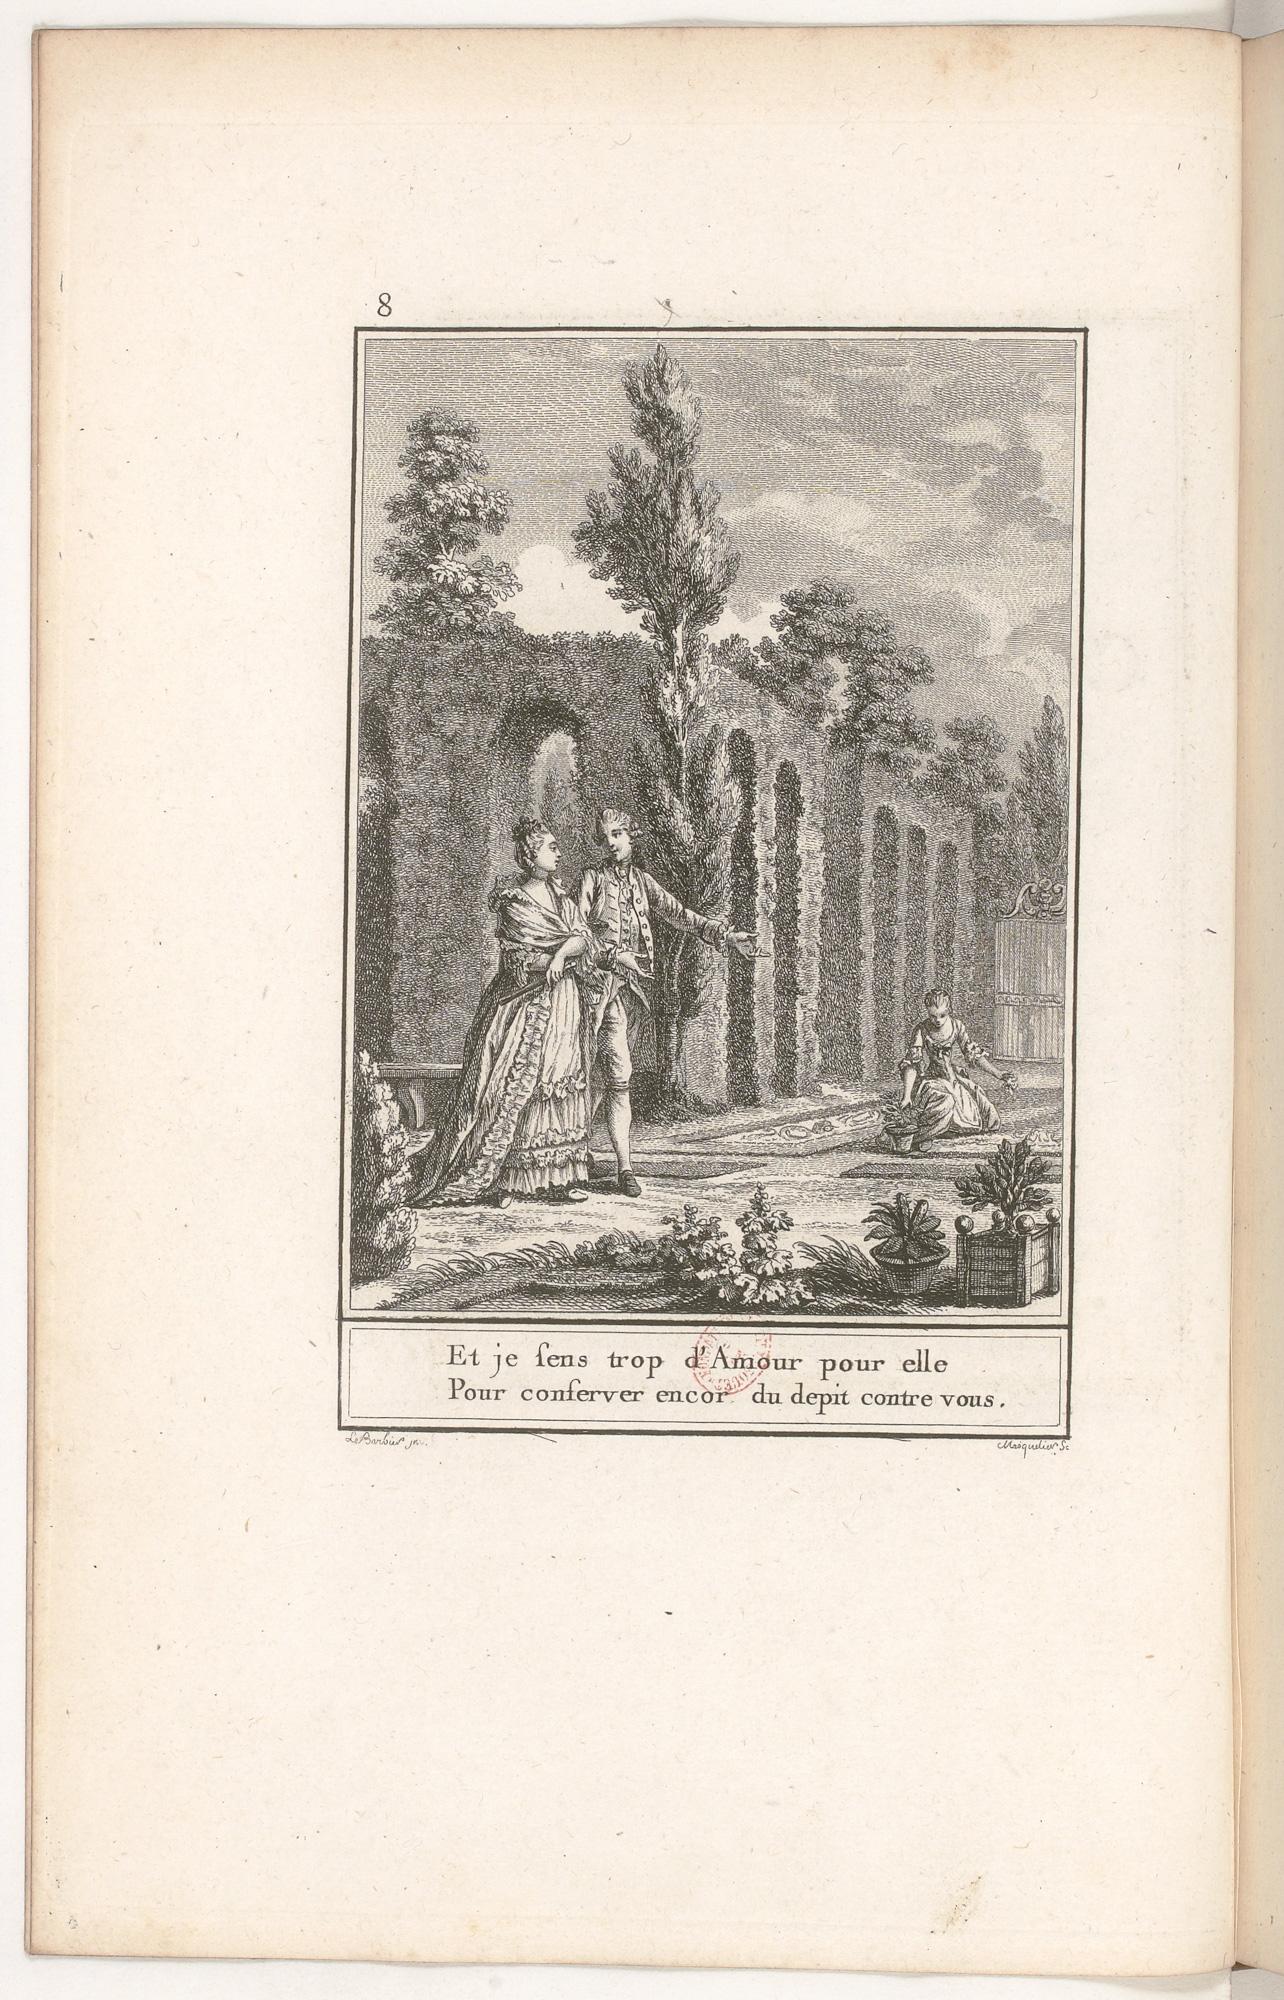 S.4.02 La consolation, 1772, Image